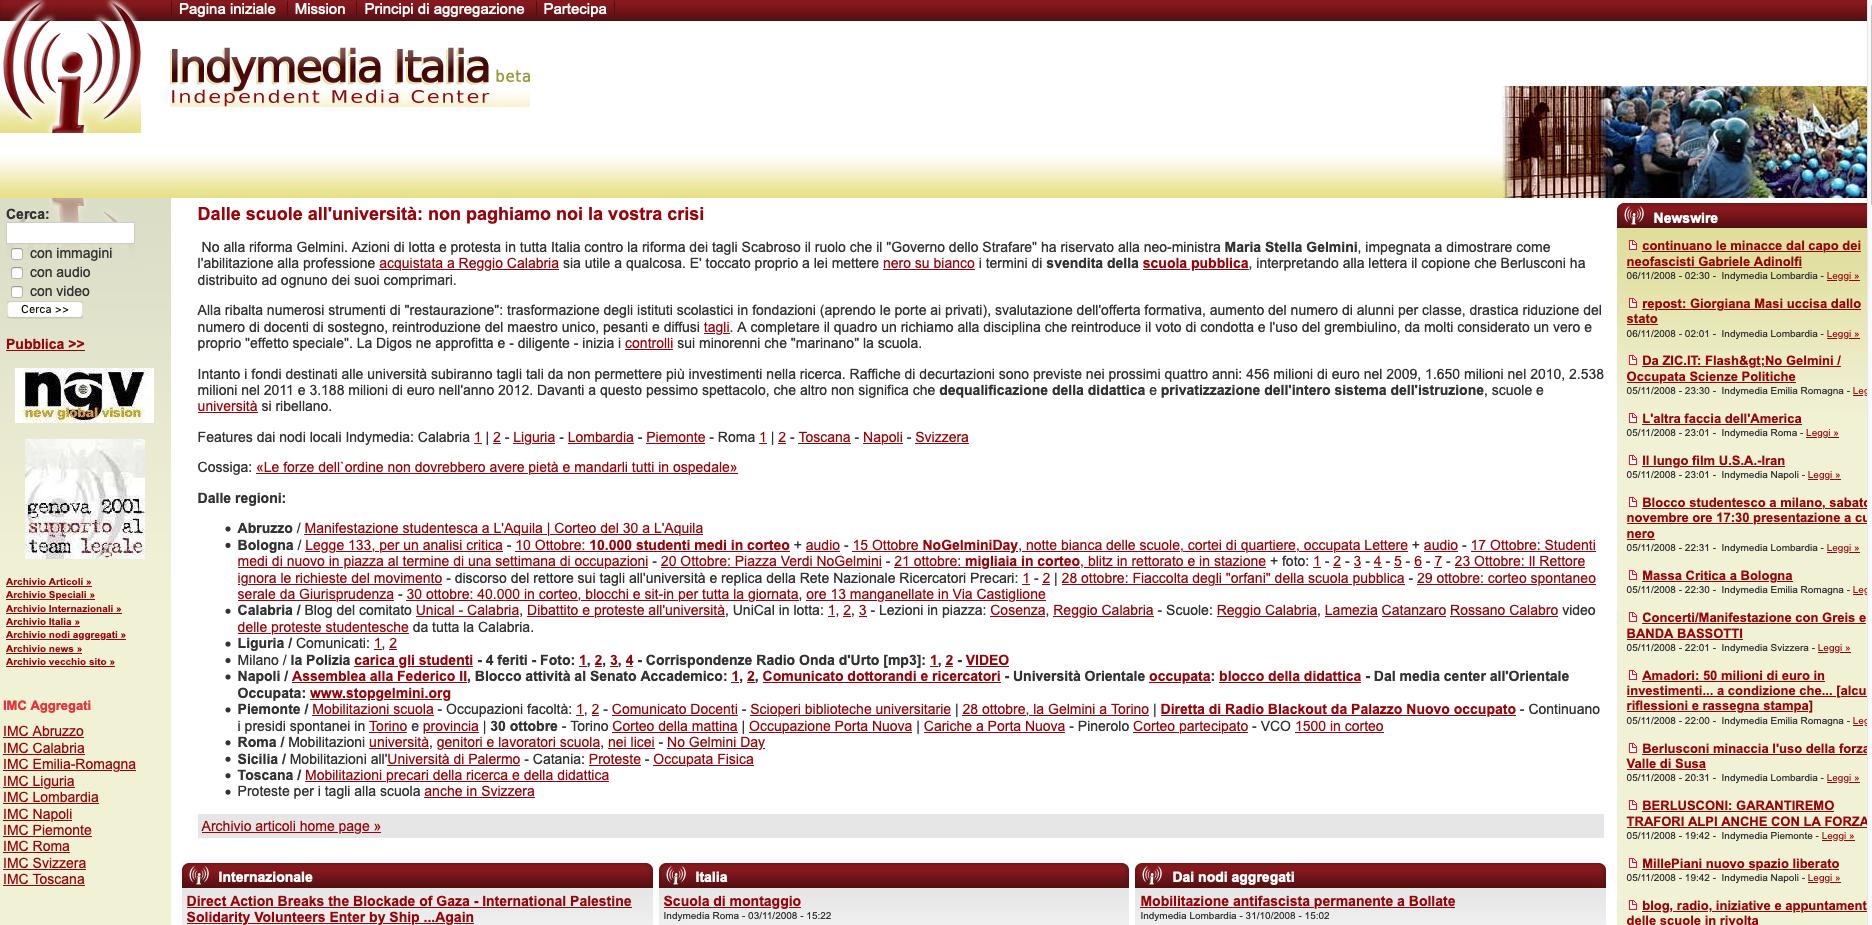 200811 beta_italy.indymedia.org